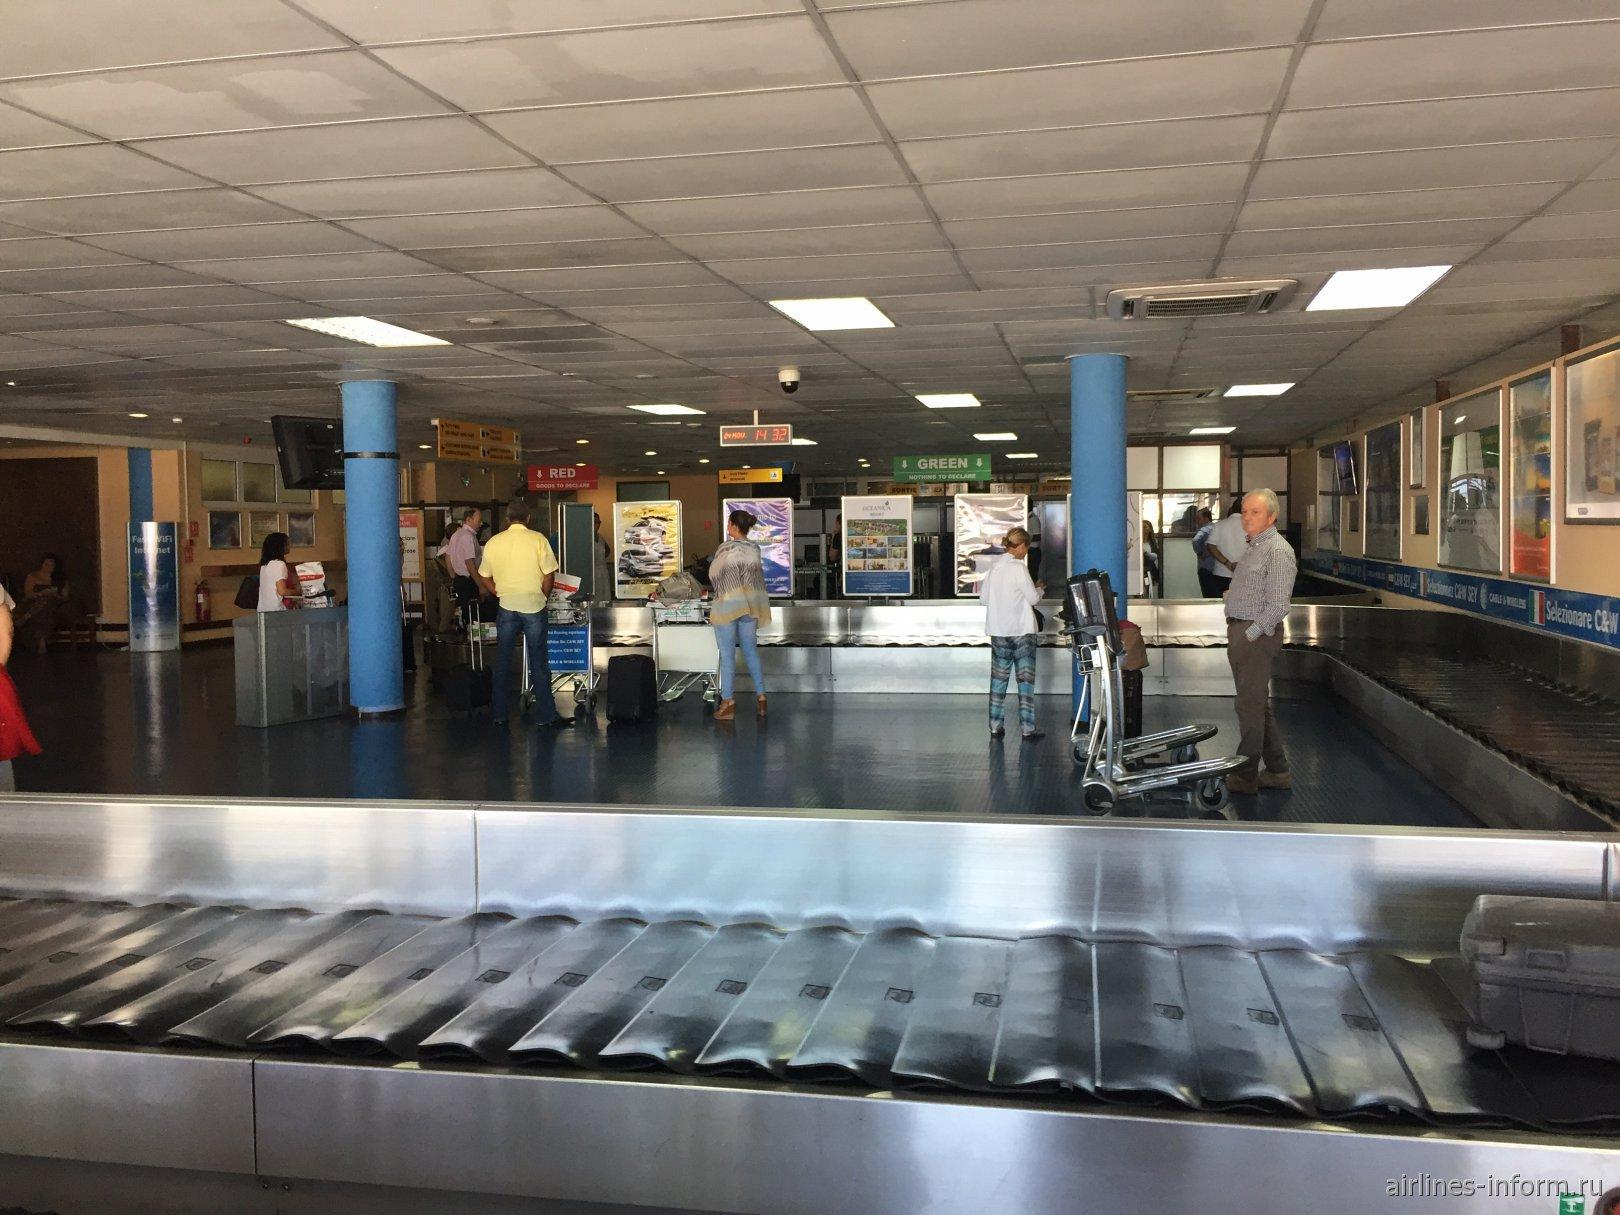 Зал выдачи багажа в аэропорту Маэ Сейшелы